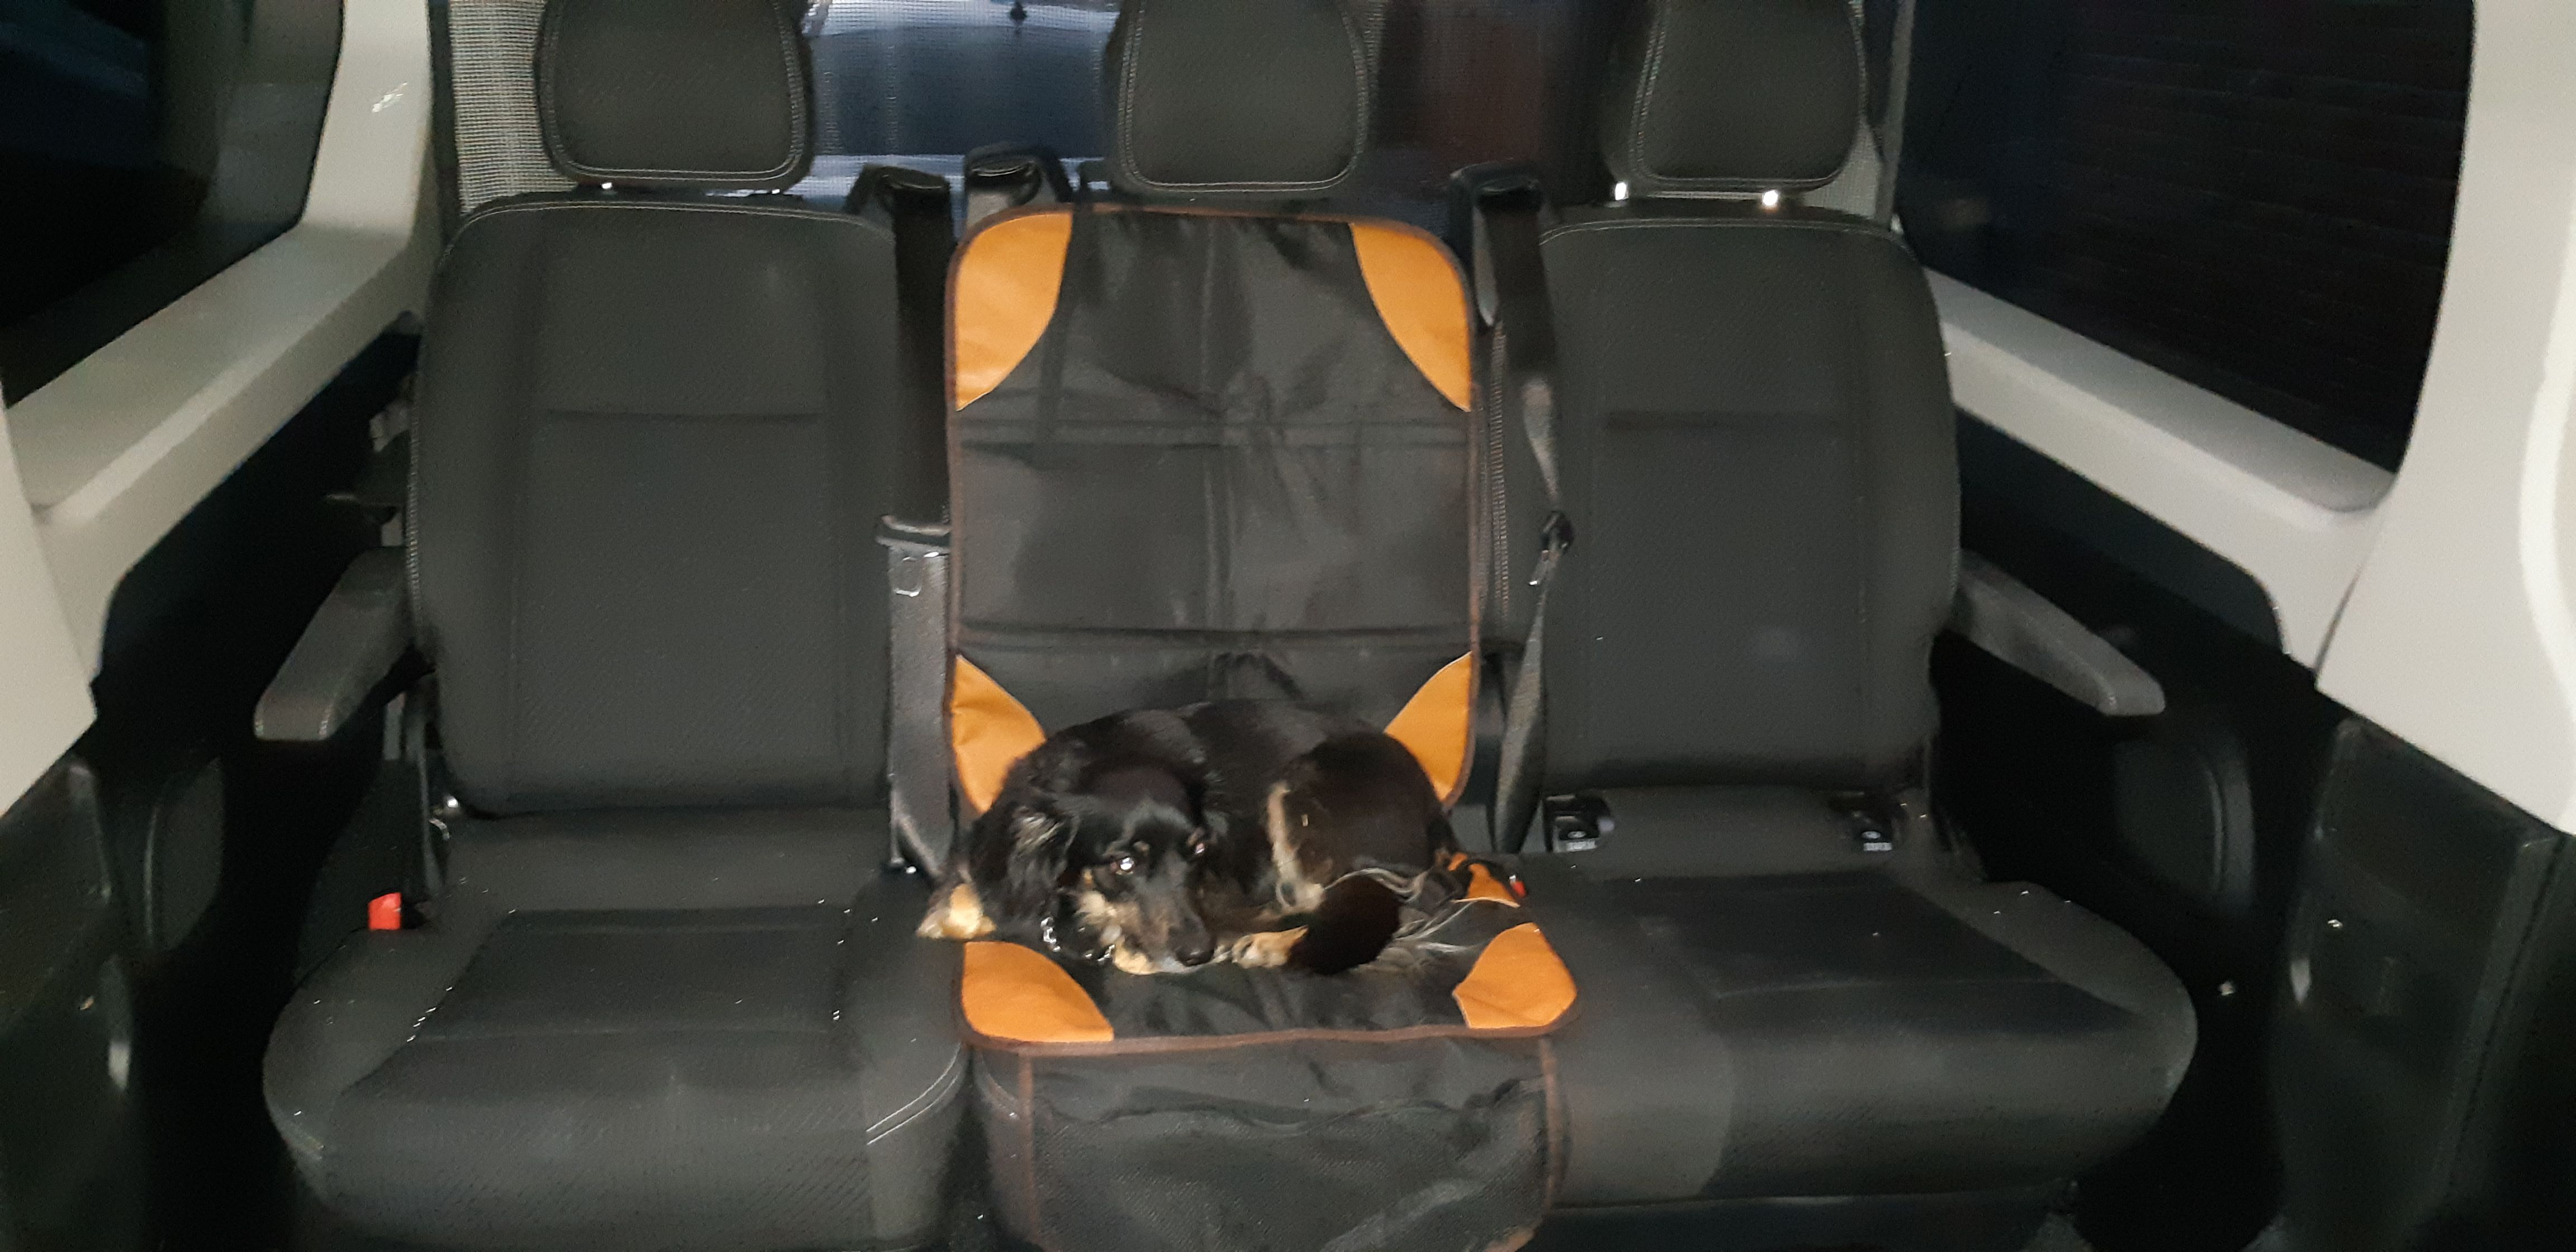 Empresa de transporte de mascotas en Alcalá de Henares